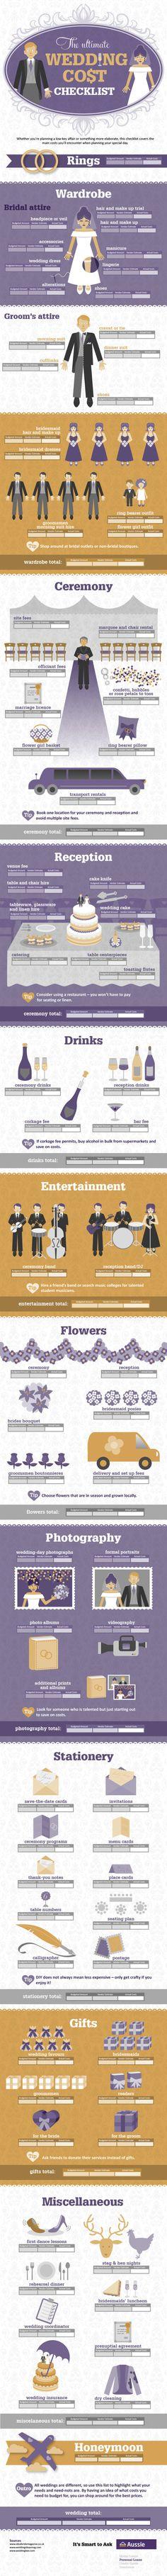 idea, futur, stuff, plan, cost checklist, dream, weddings, big, checklist infograph